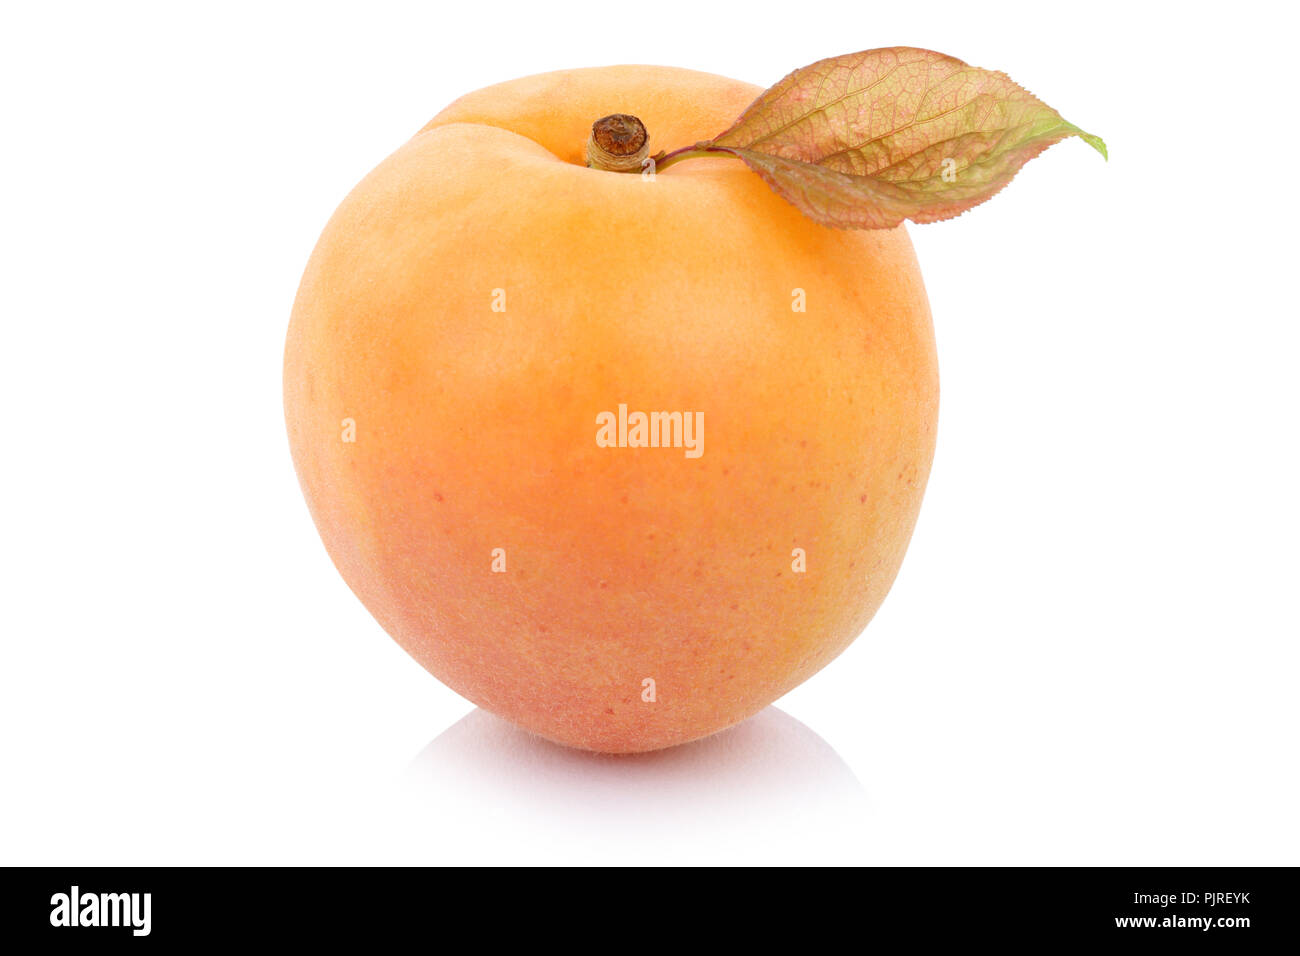 Apricot fresh fruit isolated on a white background - Stock Image